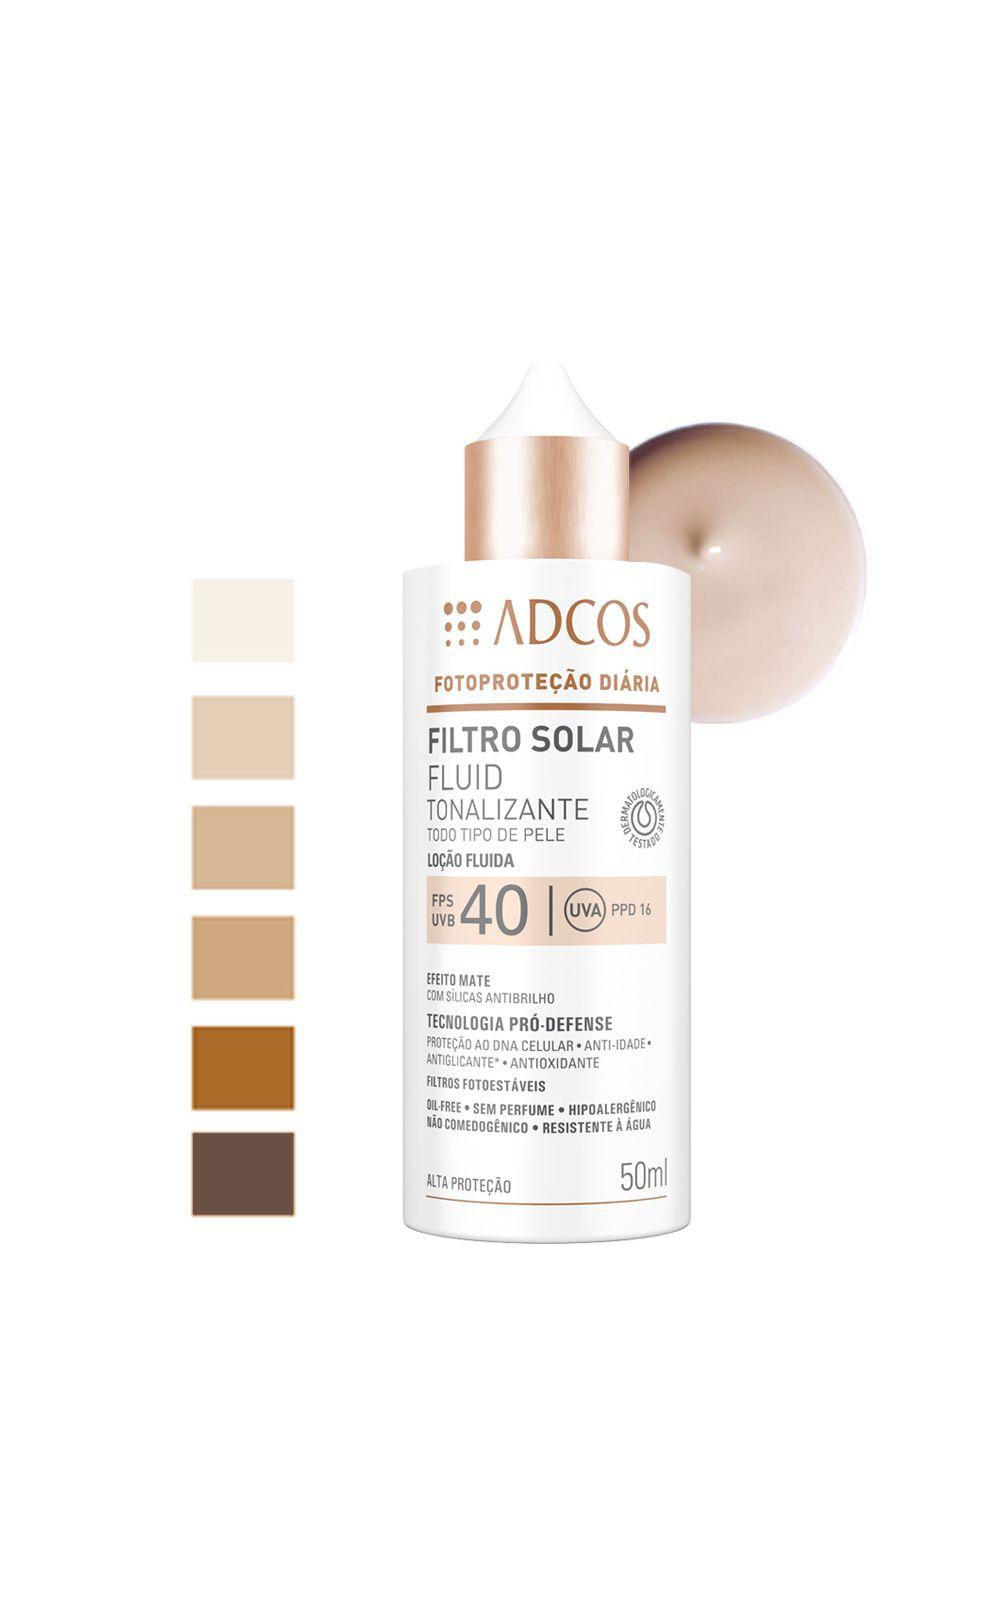 Foto 4 - Adcos Filtro Solar Fluid Tonalizante Fps40 - Peach